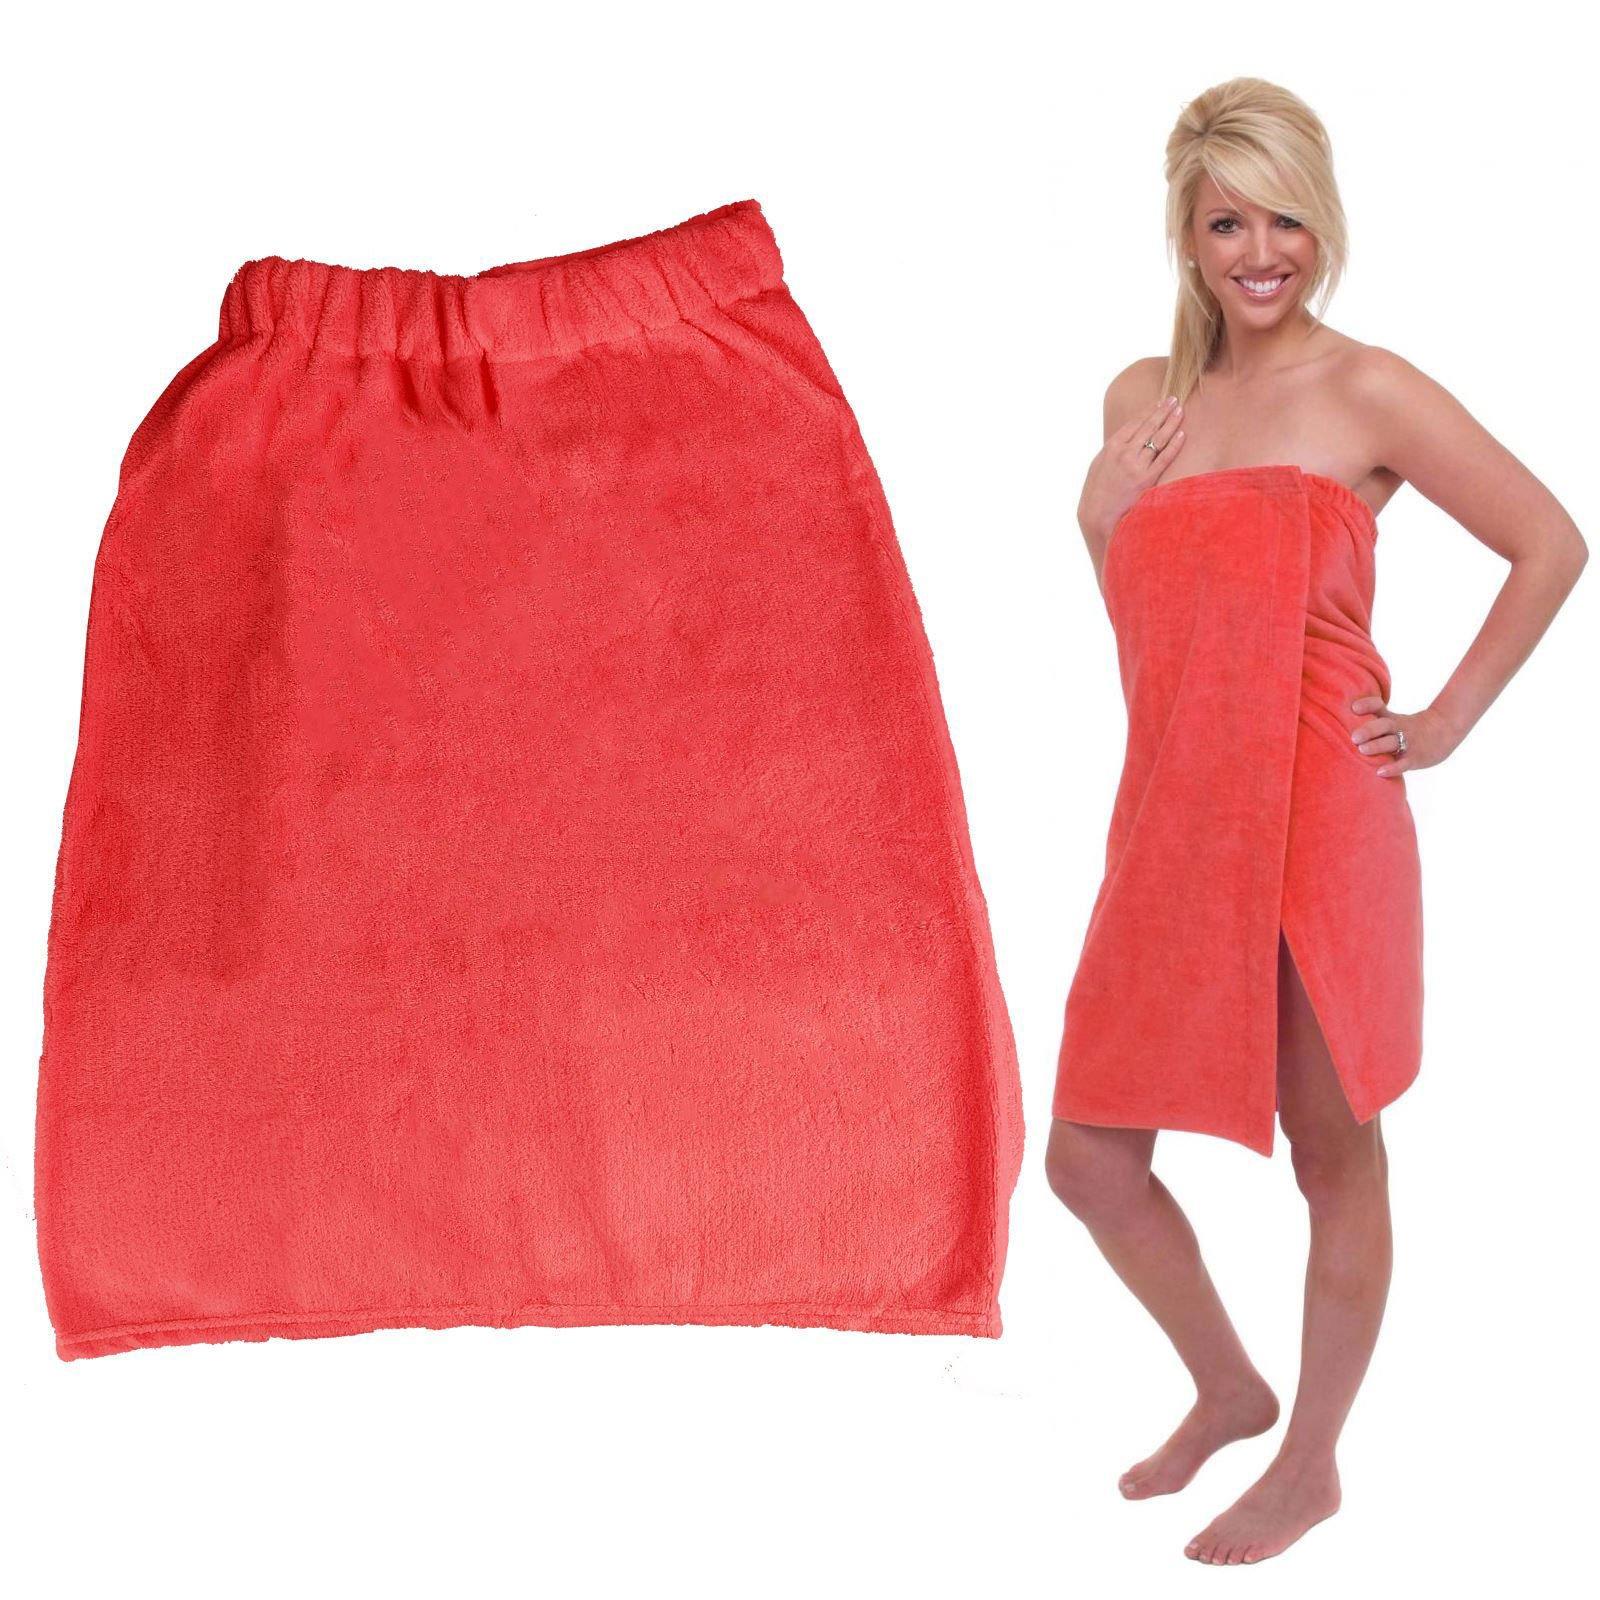 UNAKIM--Ladies Bath Towel Super Soft Shower Spa Wrap Velcro Closer Womens Beach Cover Up